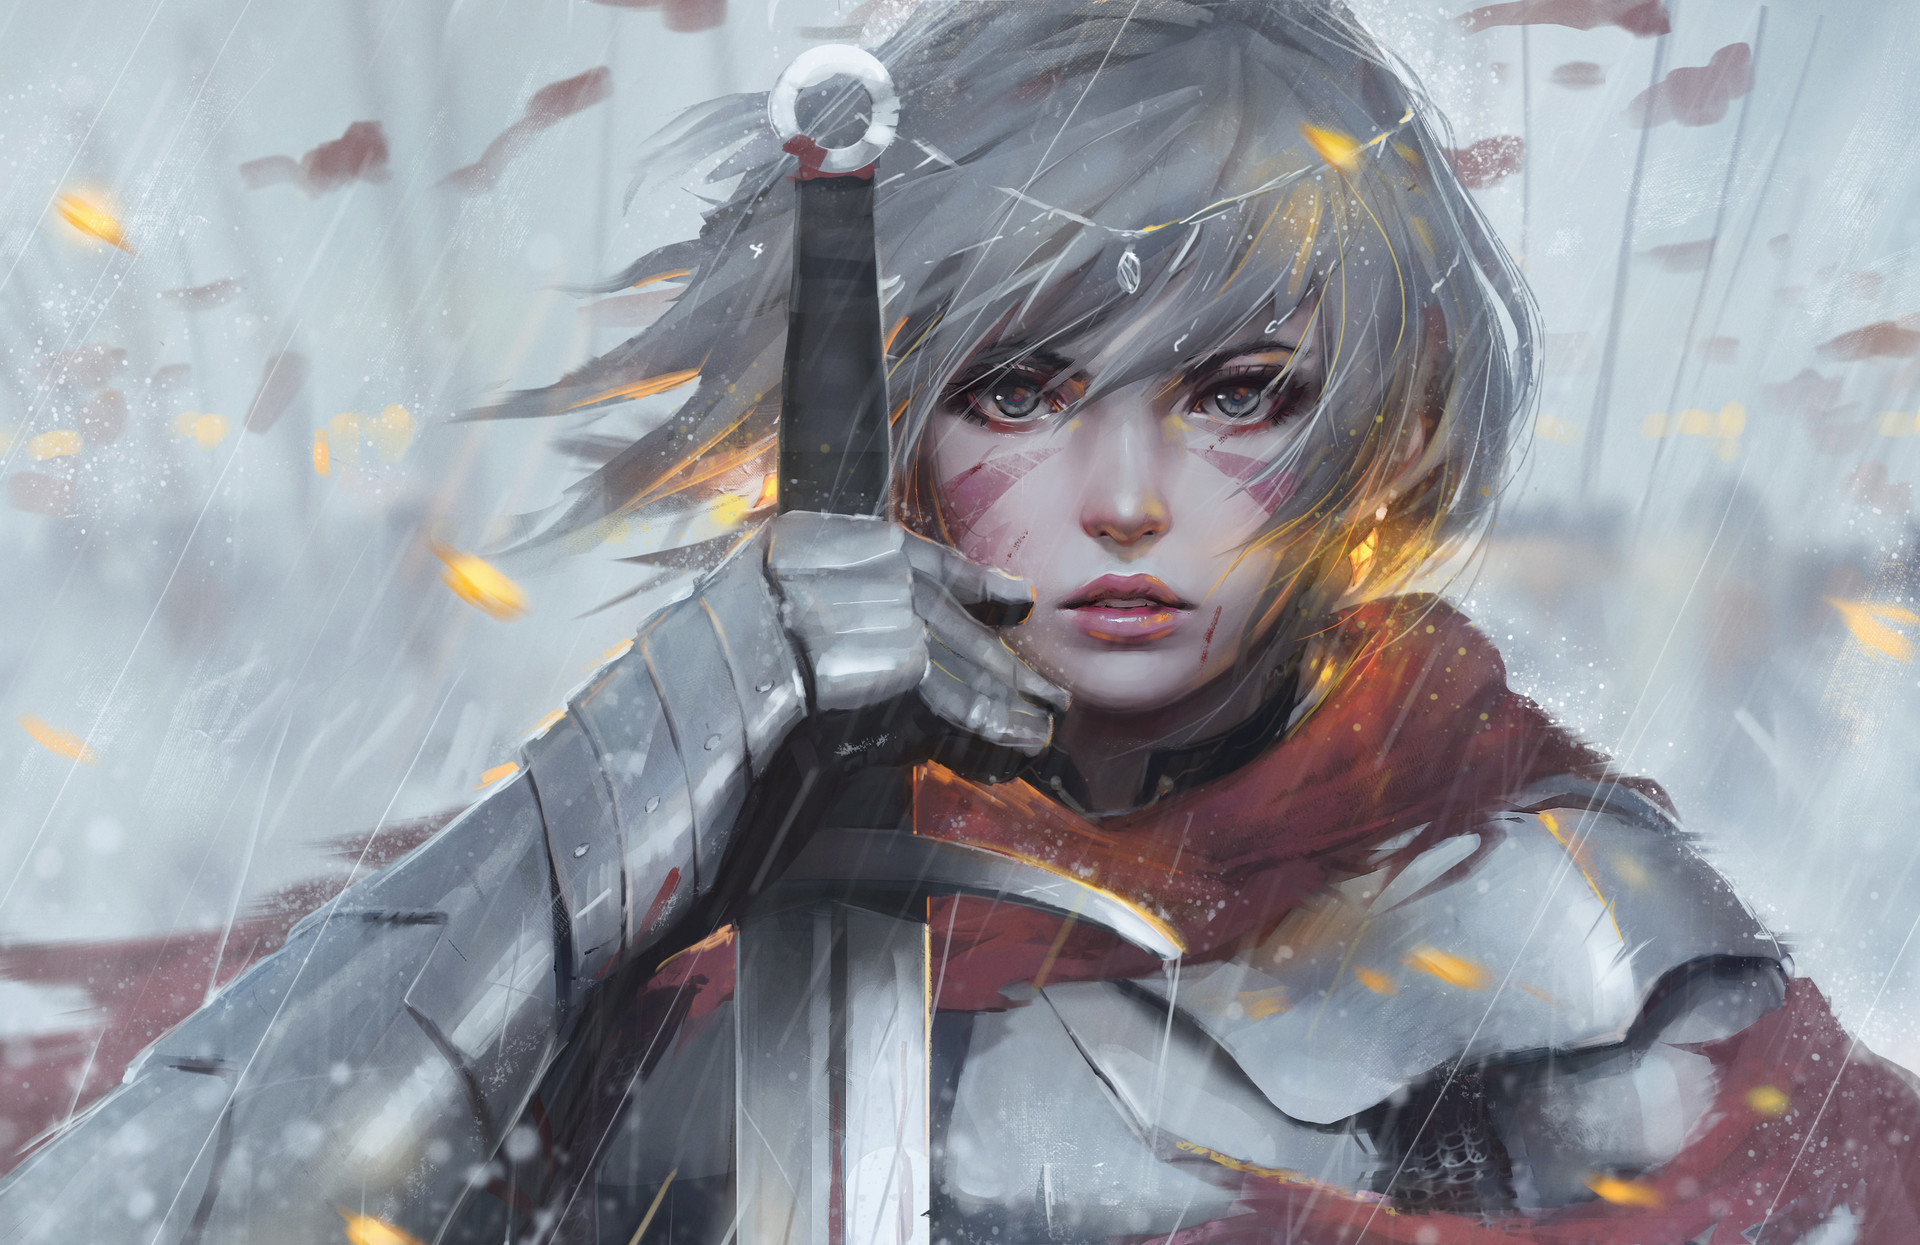 z-w-gu-knight2.jpg?1484185483